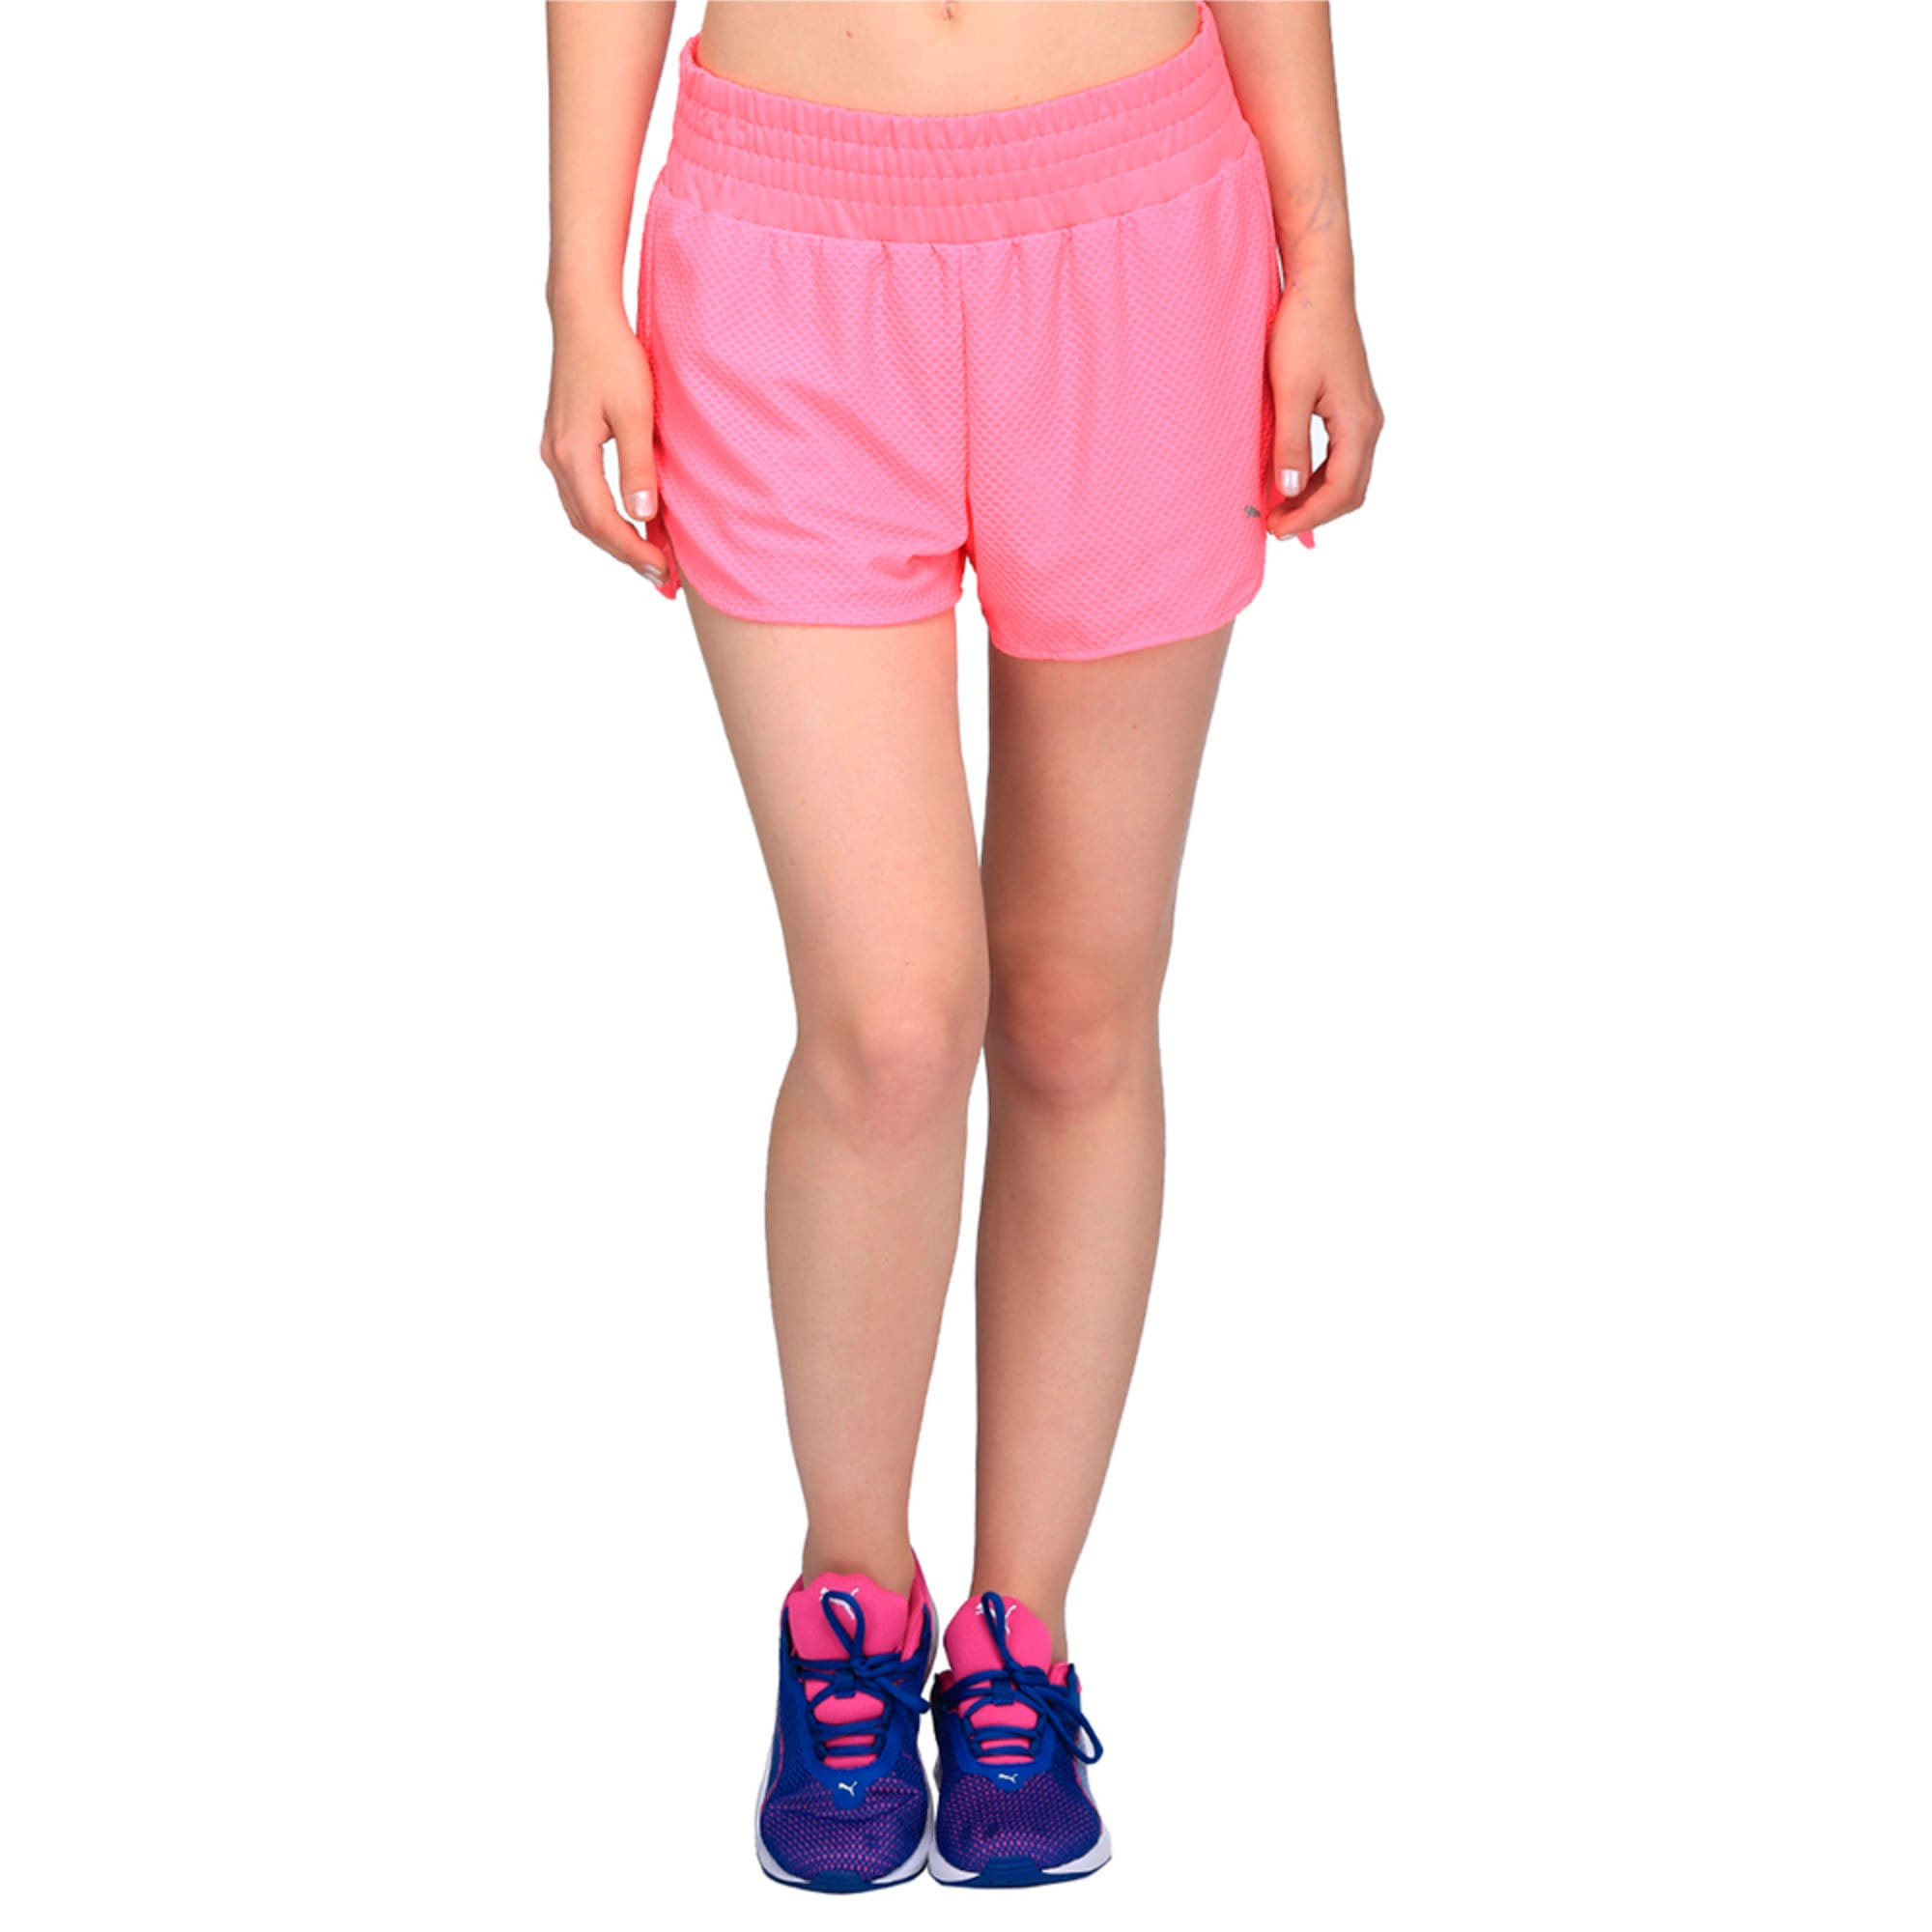 Thumbnail 1 of Active Training Women's Mesh Shorts, KNOCKOUT PINK, medium-IND